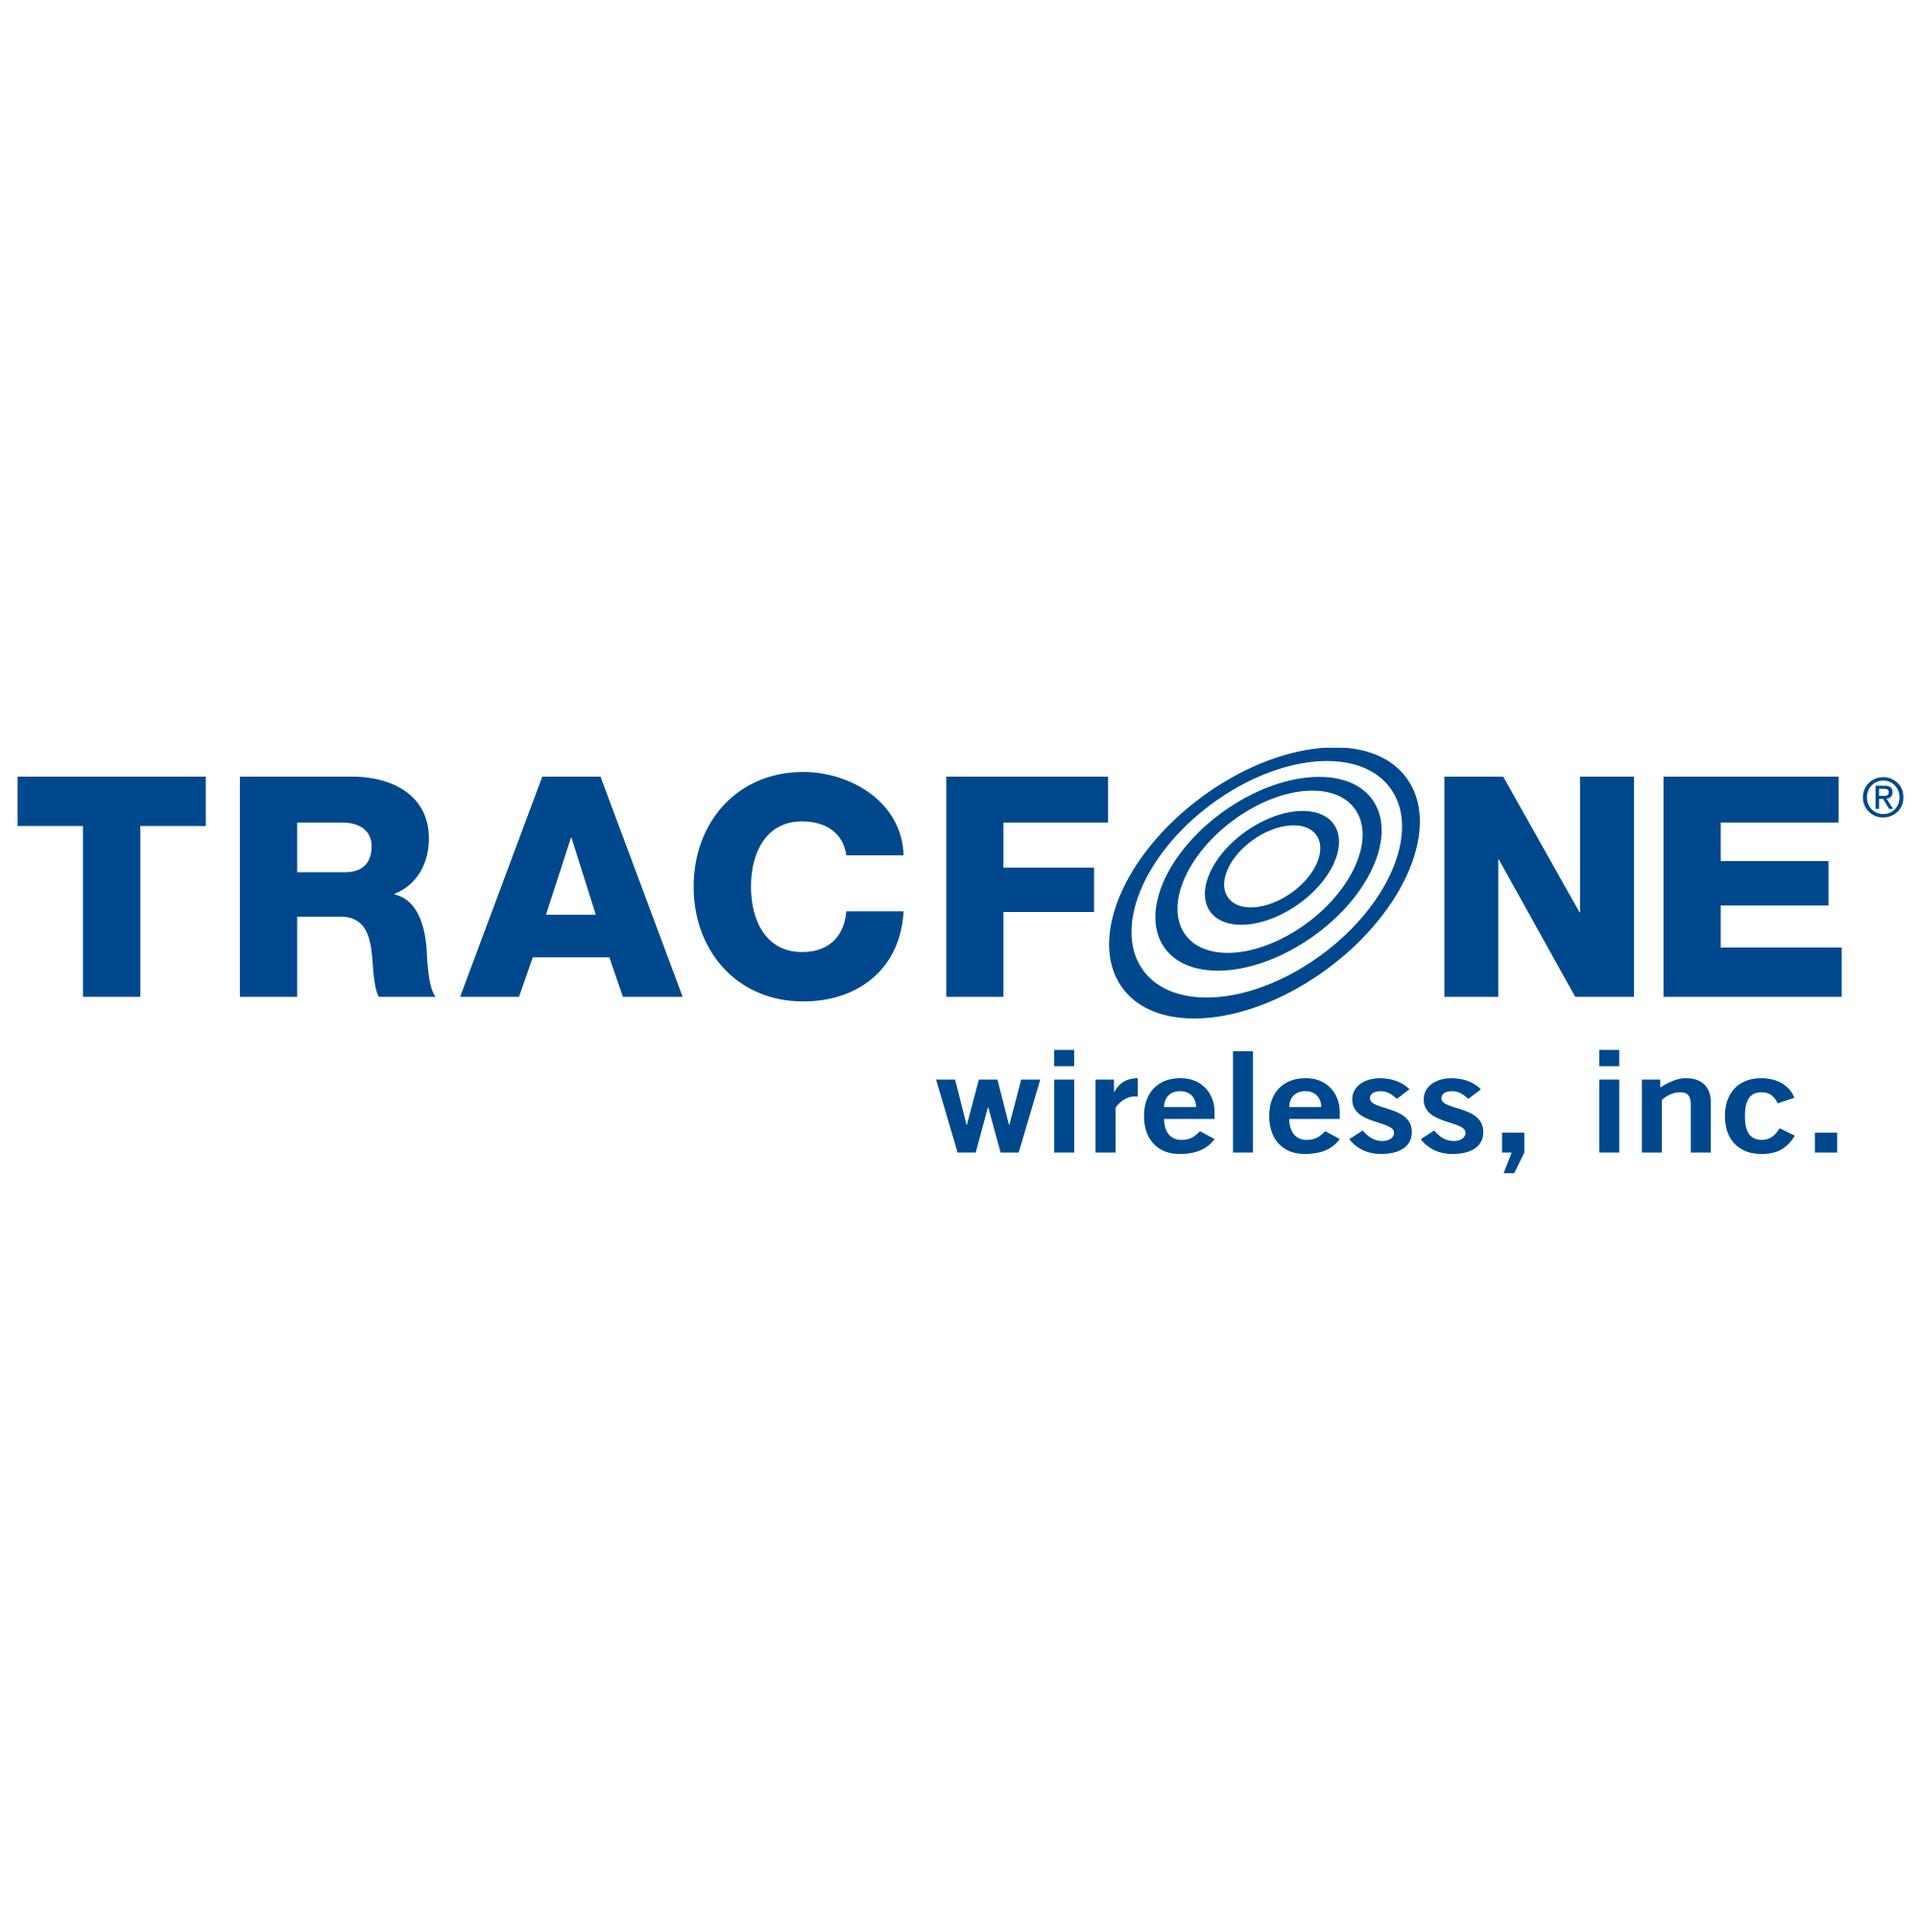 Tracfone Wireless Logo 5